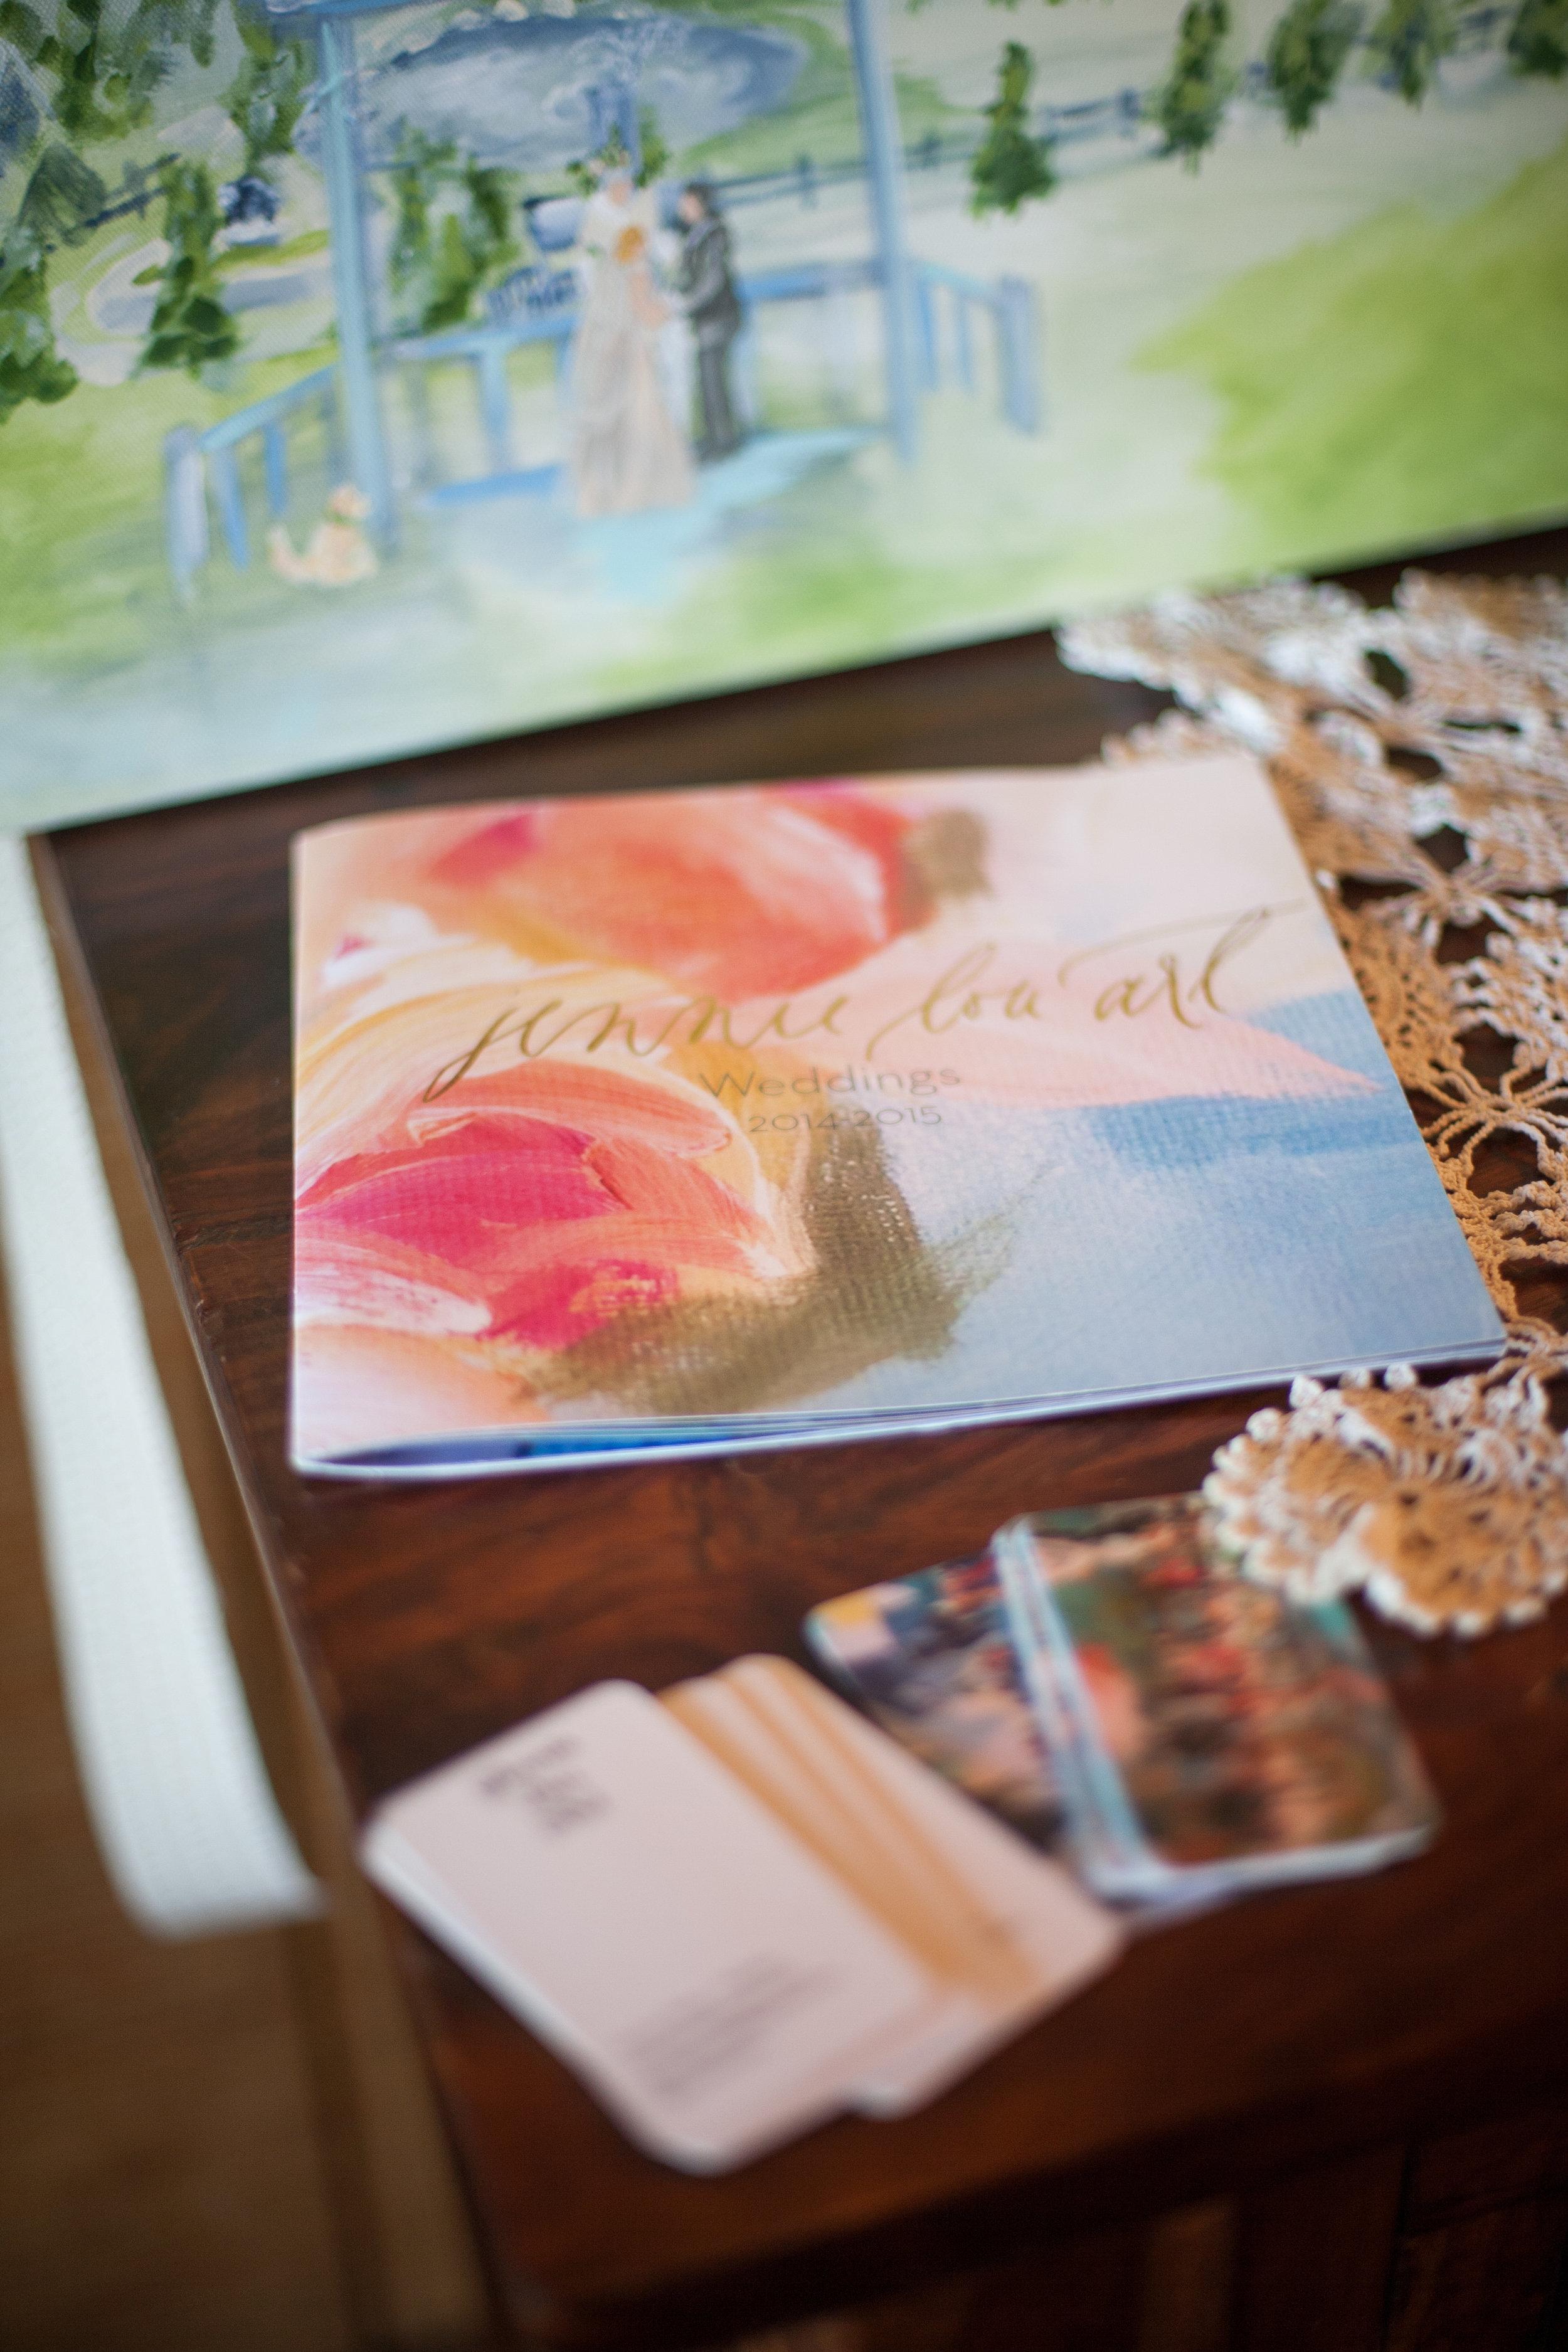 Kyle-Scott-Spruce-Mountain-wedding-by-Lisa-O'Dwyer-664.jpg